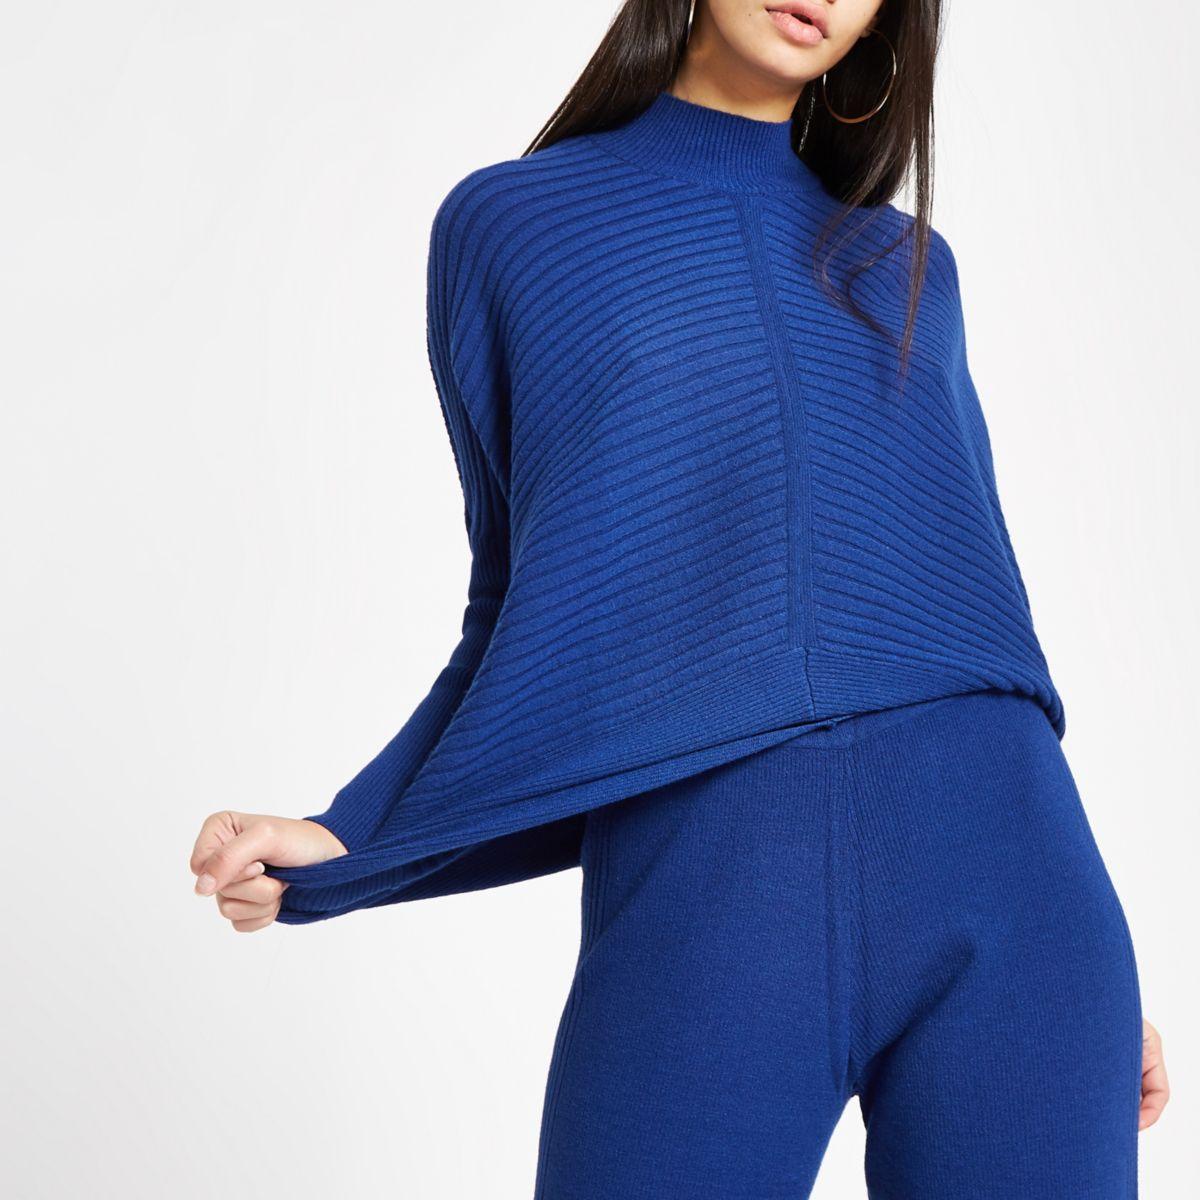 Dark blue knit high neck long sleeve sweater